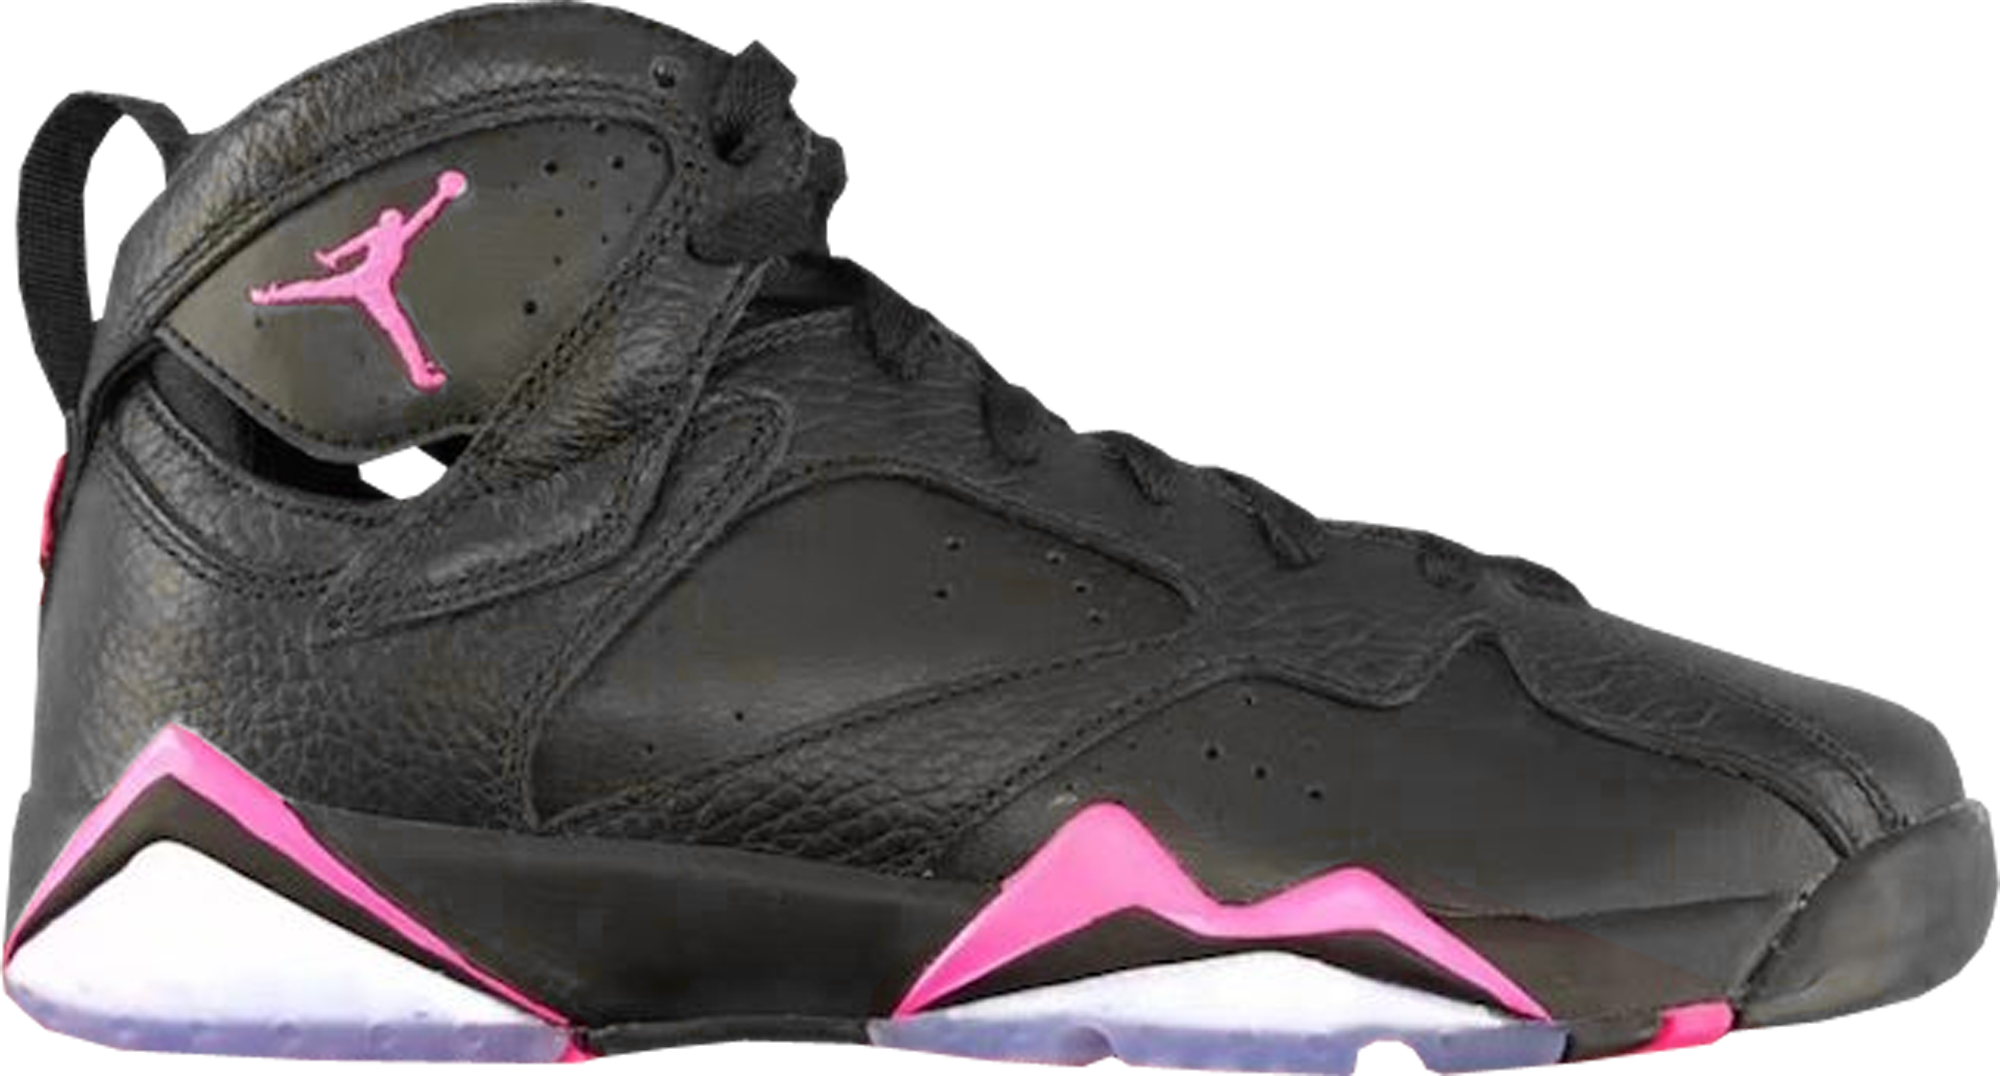 new arrival 049ff 83133 Air Jordan 7 Retro Black Hyper Pink (GS) - StockX News